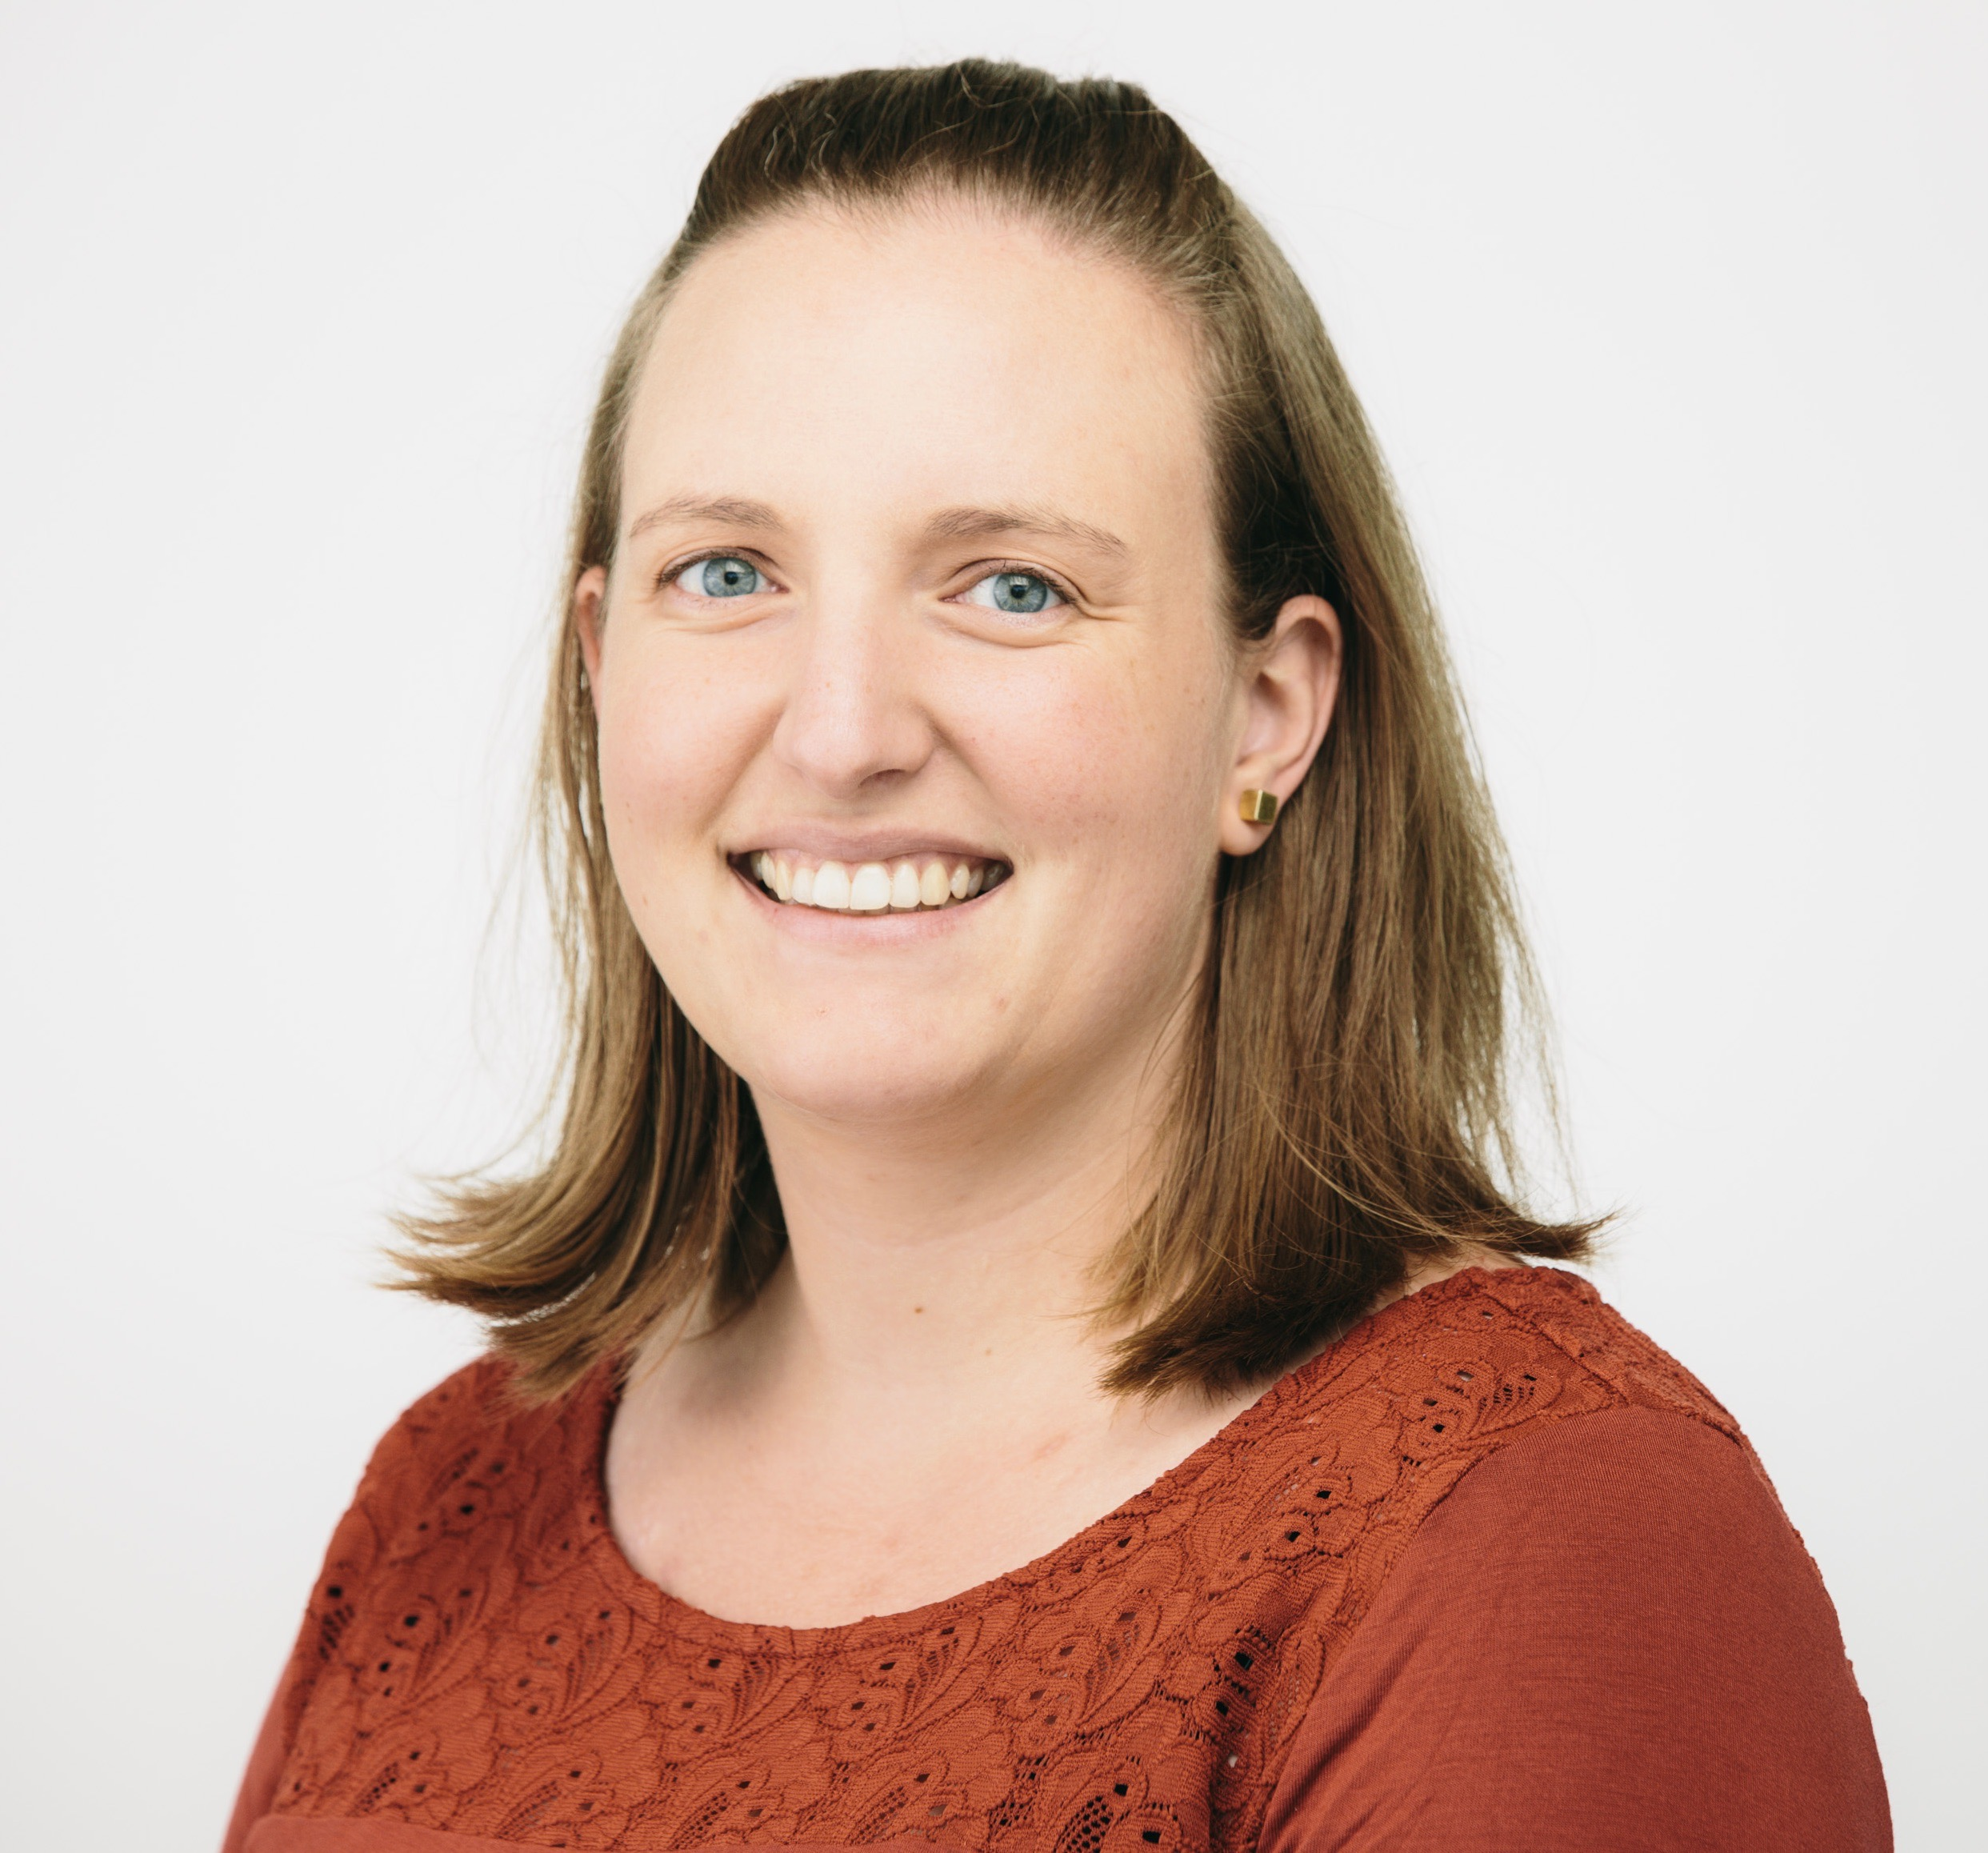 Headshot of Kathleen Hershberger, PhD